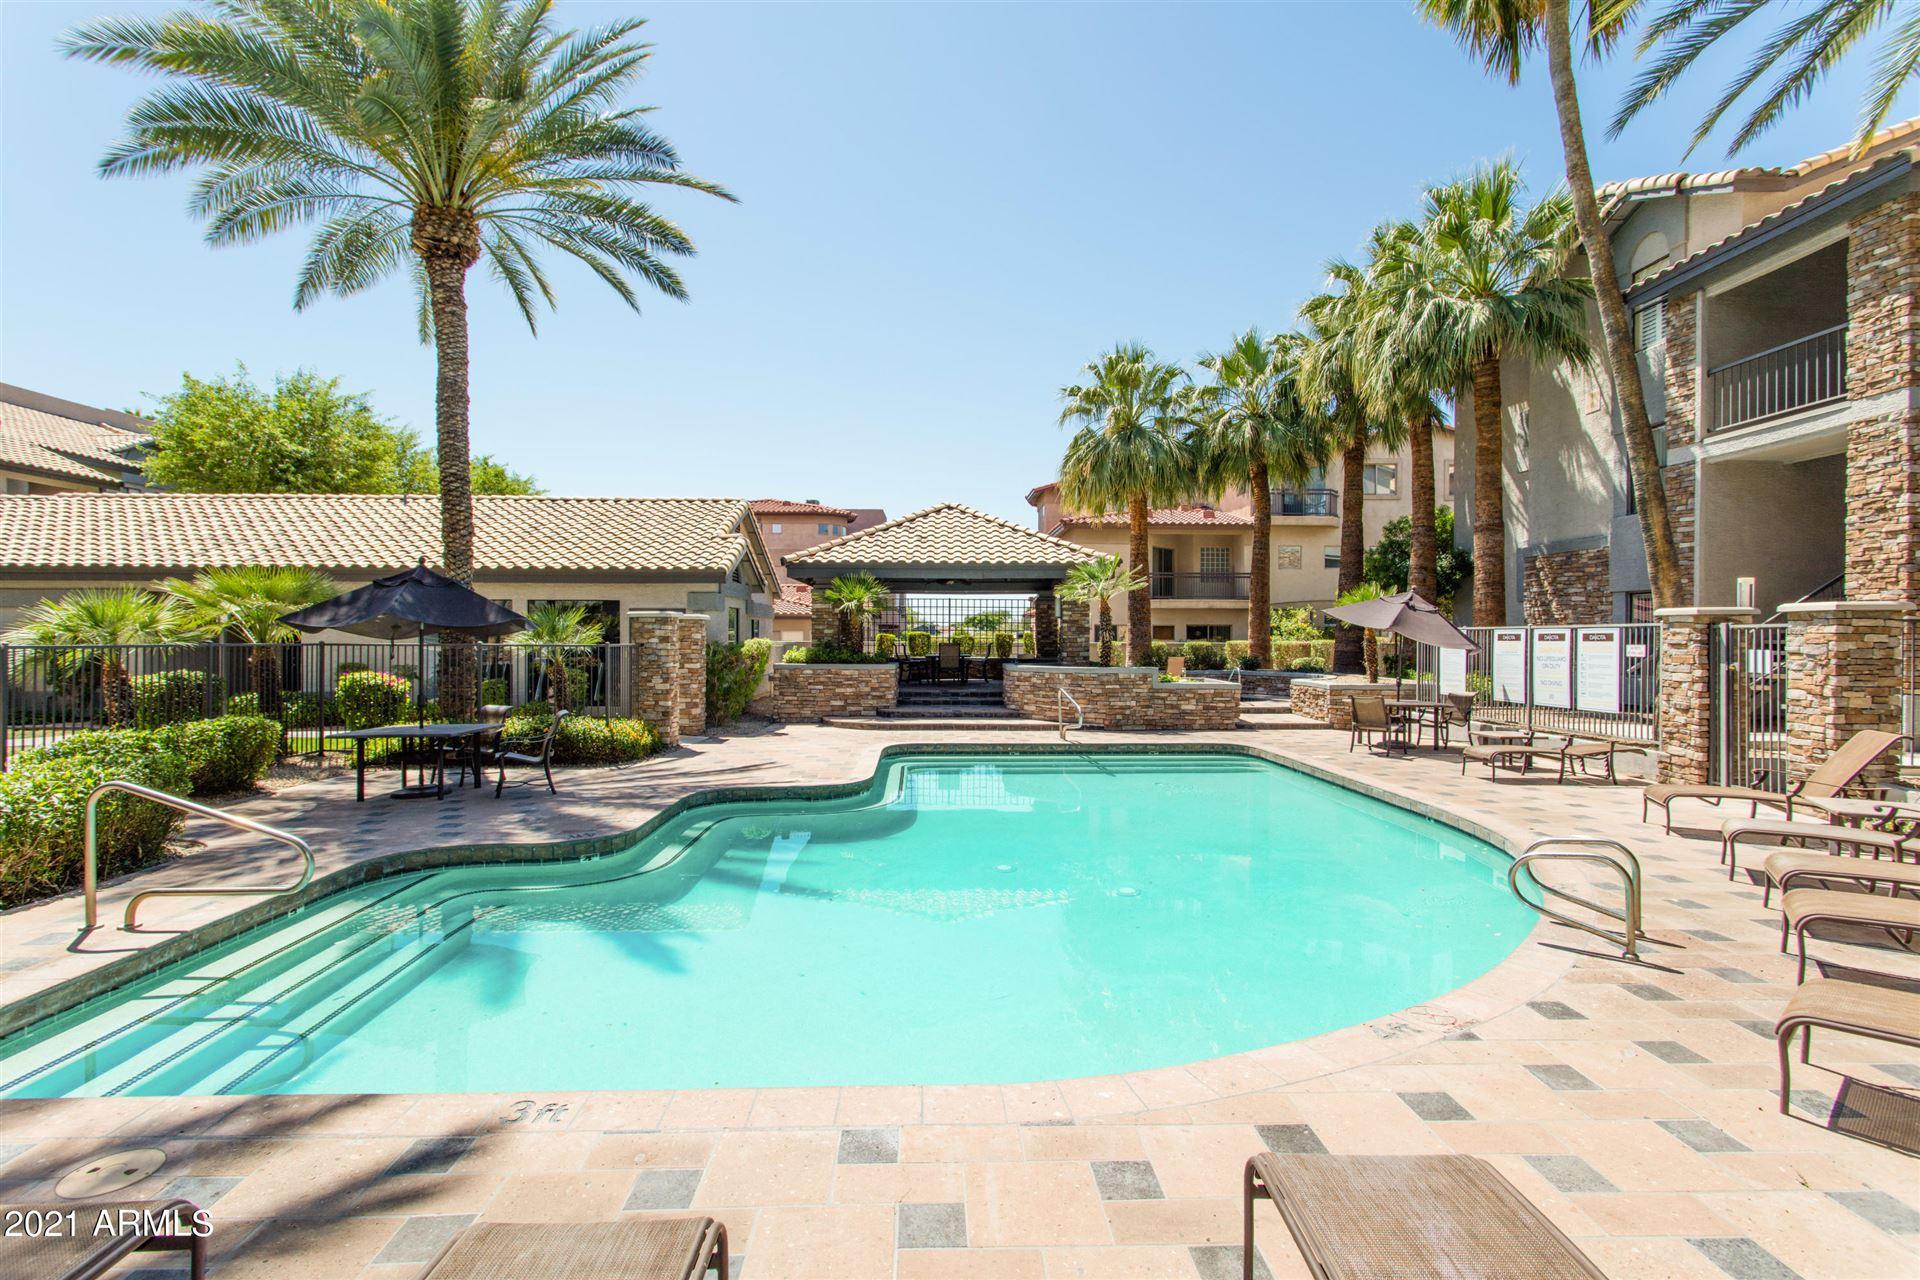 2025 E CAMPBELL Avenue #301, Phoenix, AZ 85016 - MLS#: 6232198